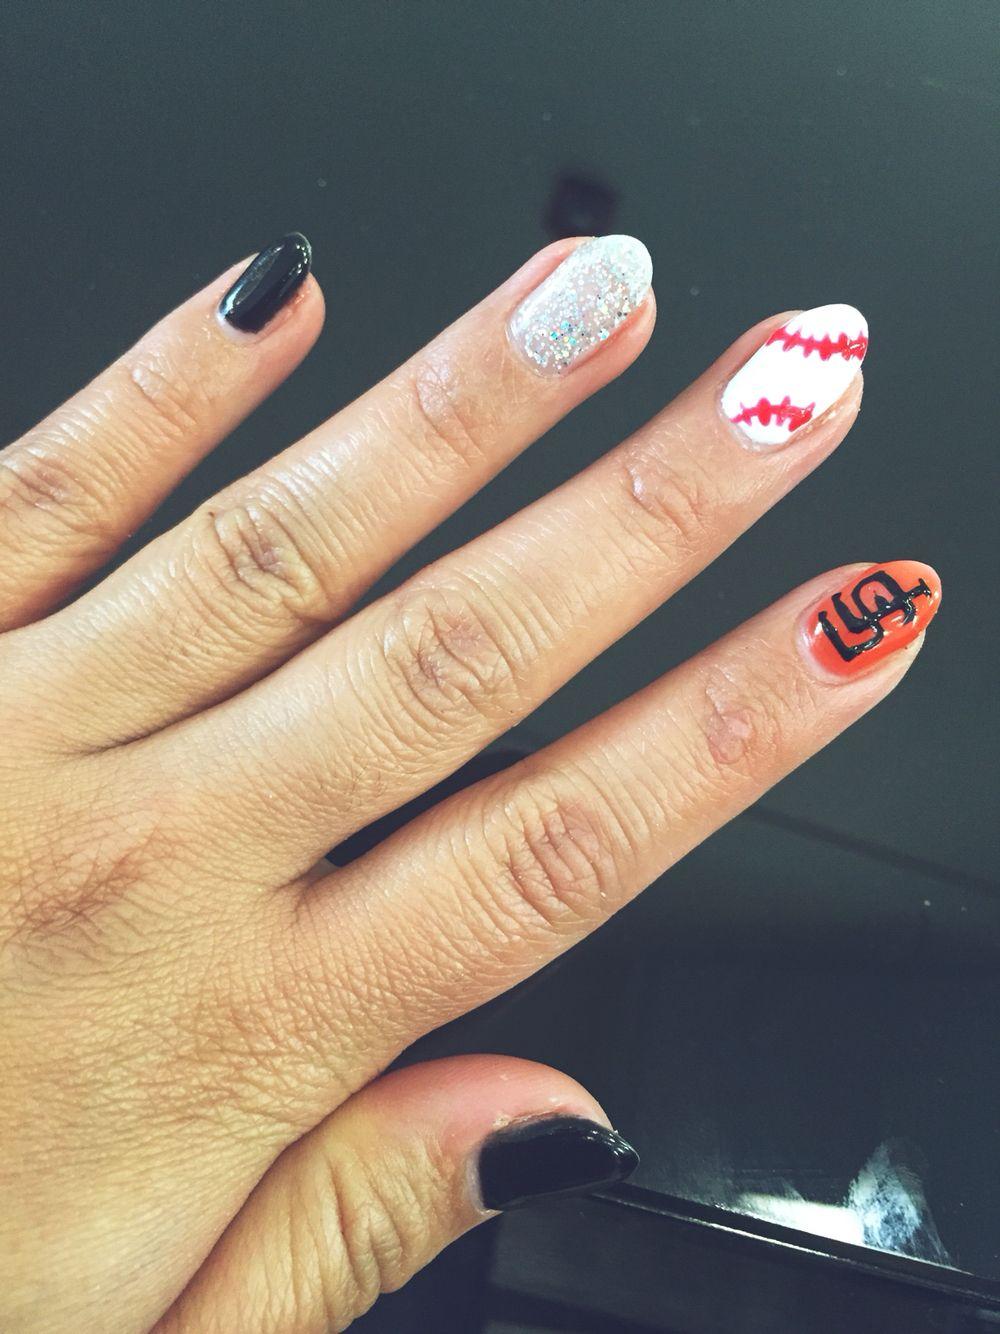 SF Giants nails -Anna Paris Nails Salon Reno NV | BEAUTIFY ME ...